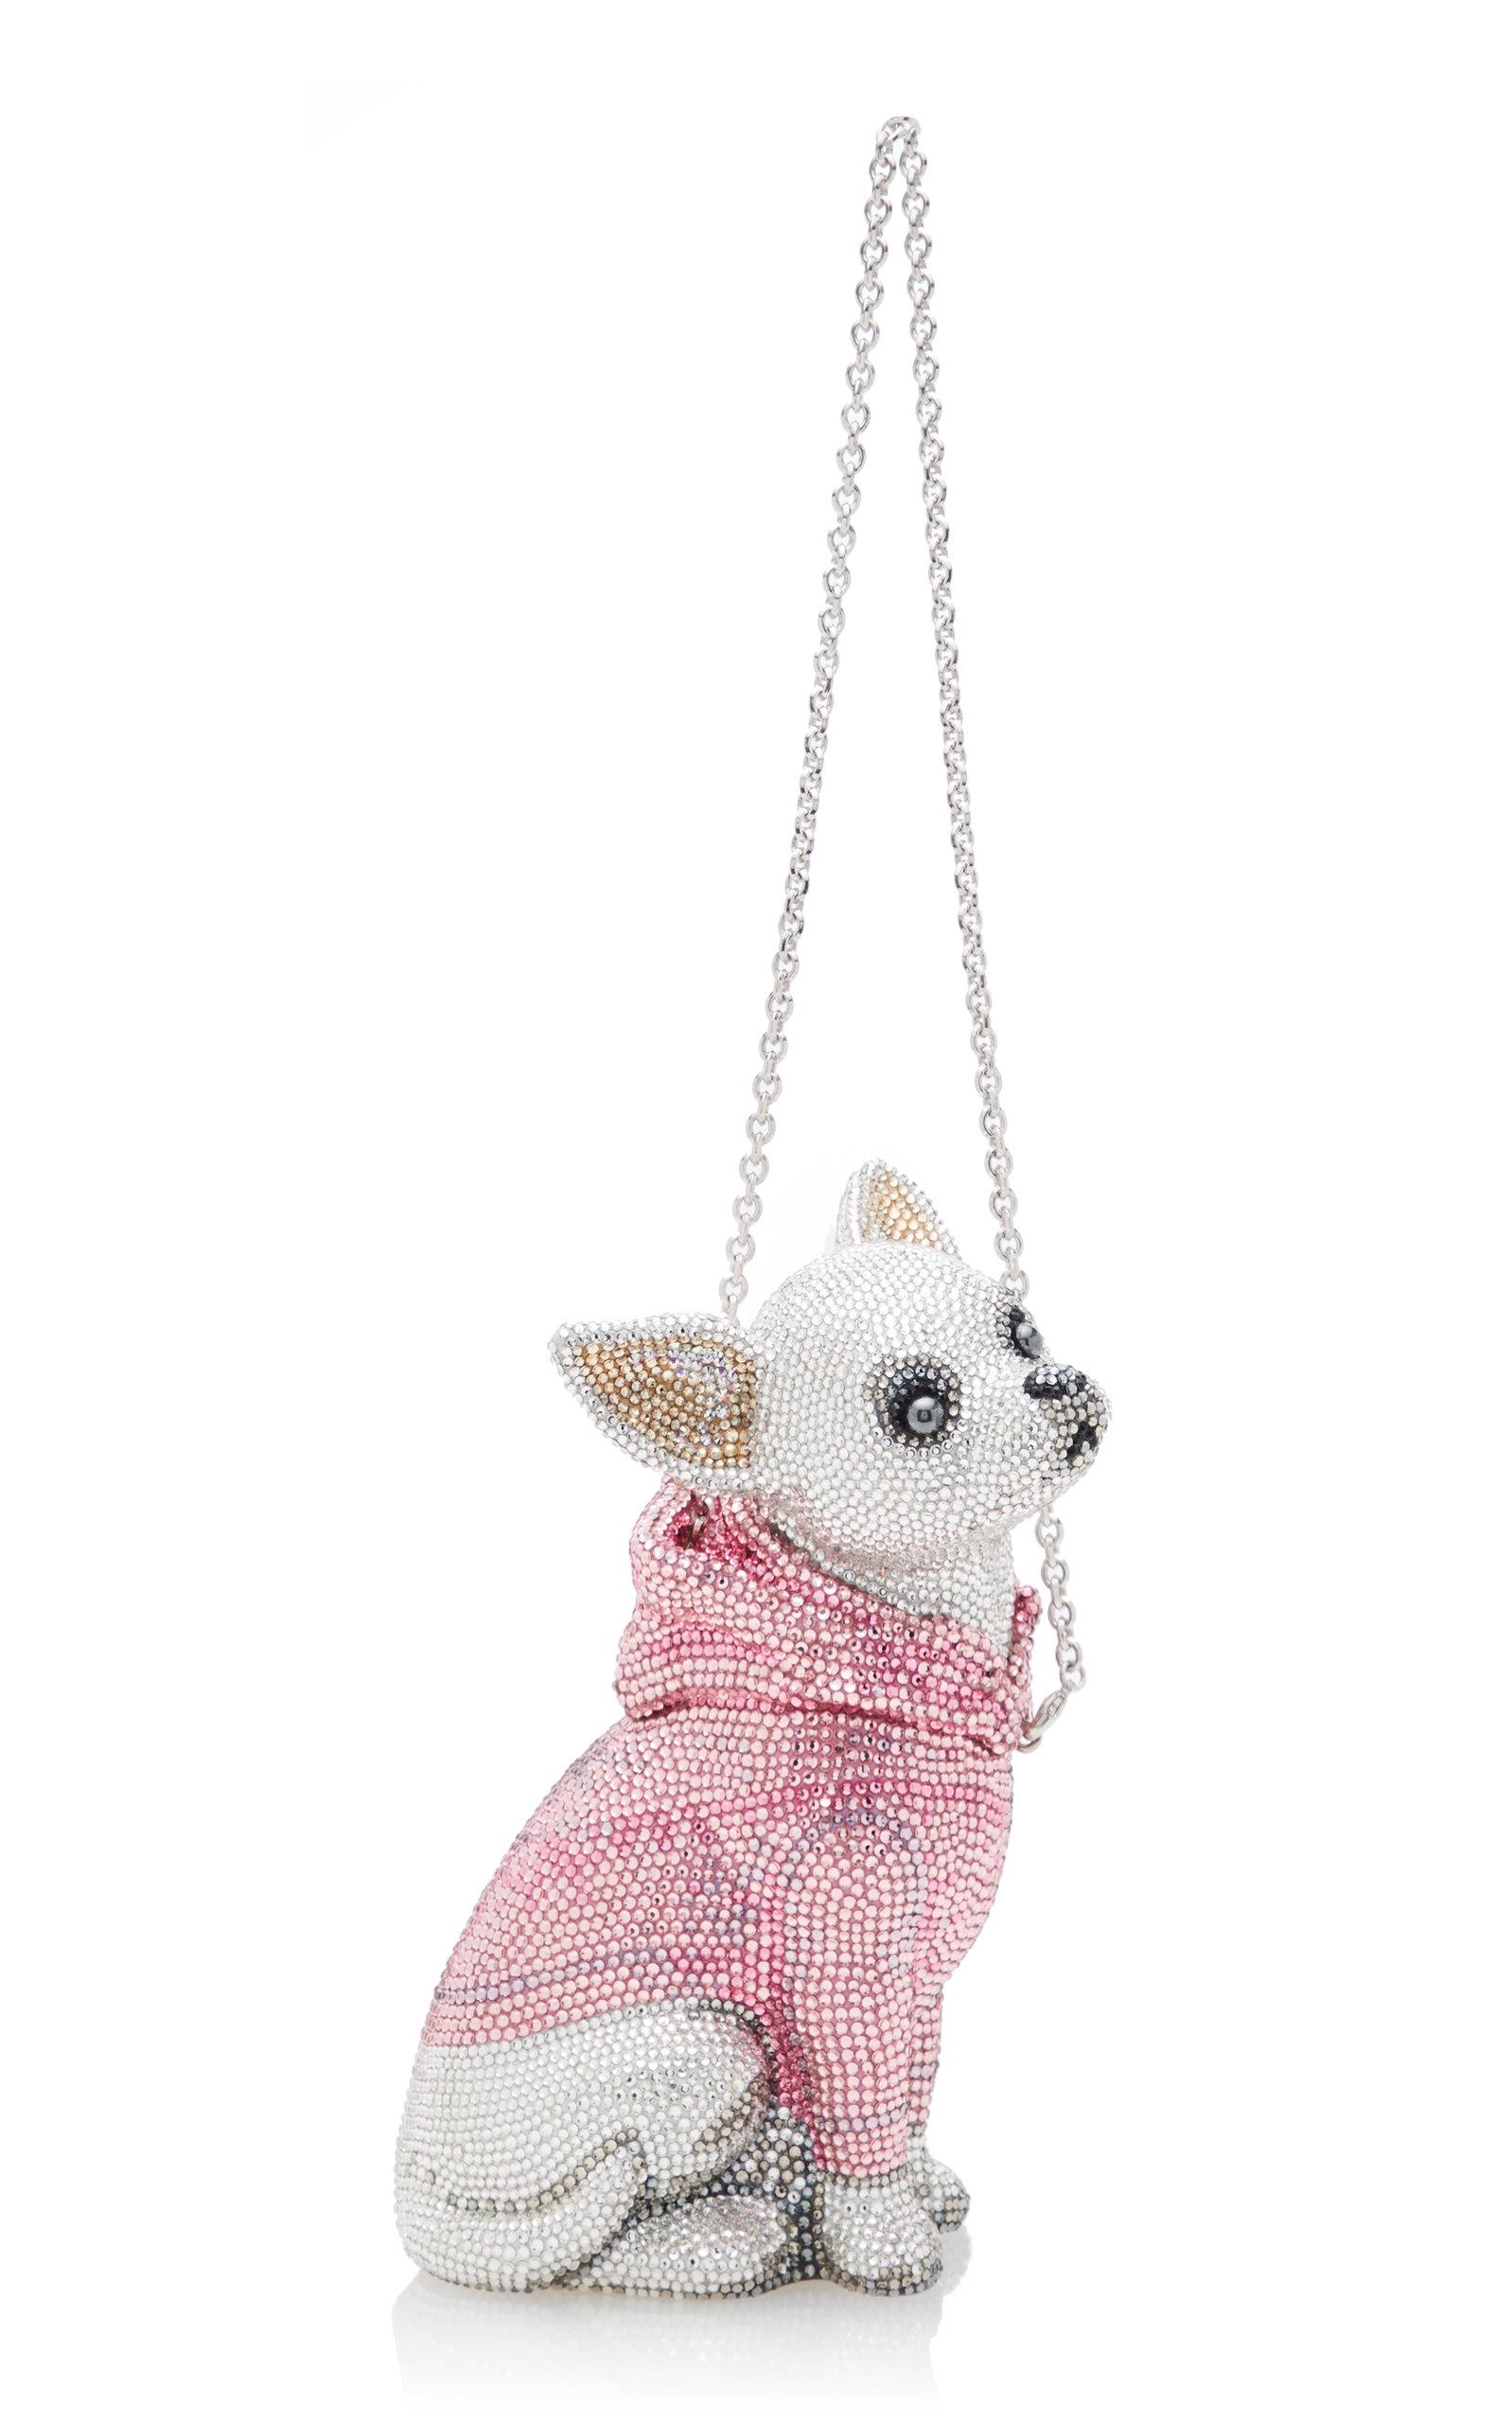 Judith Leiber Bruiser Chihuahua Clutch xy8sAw3B